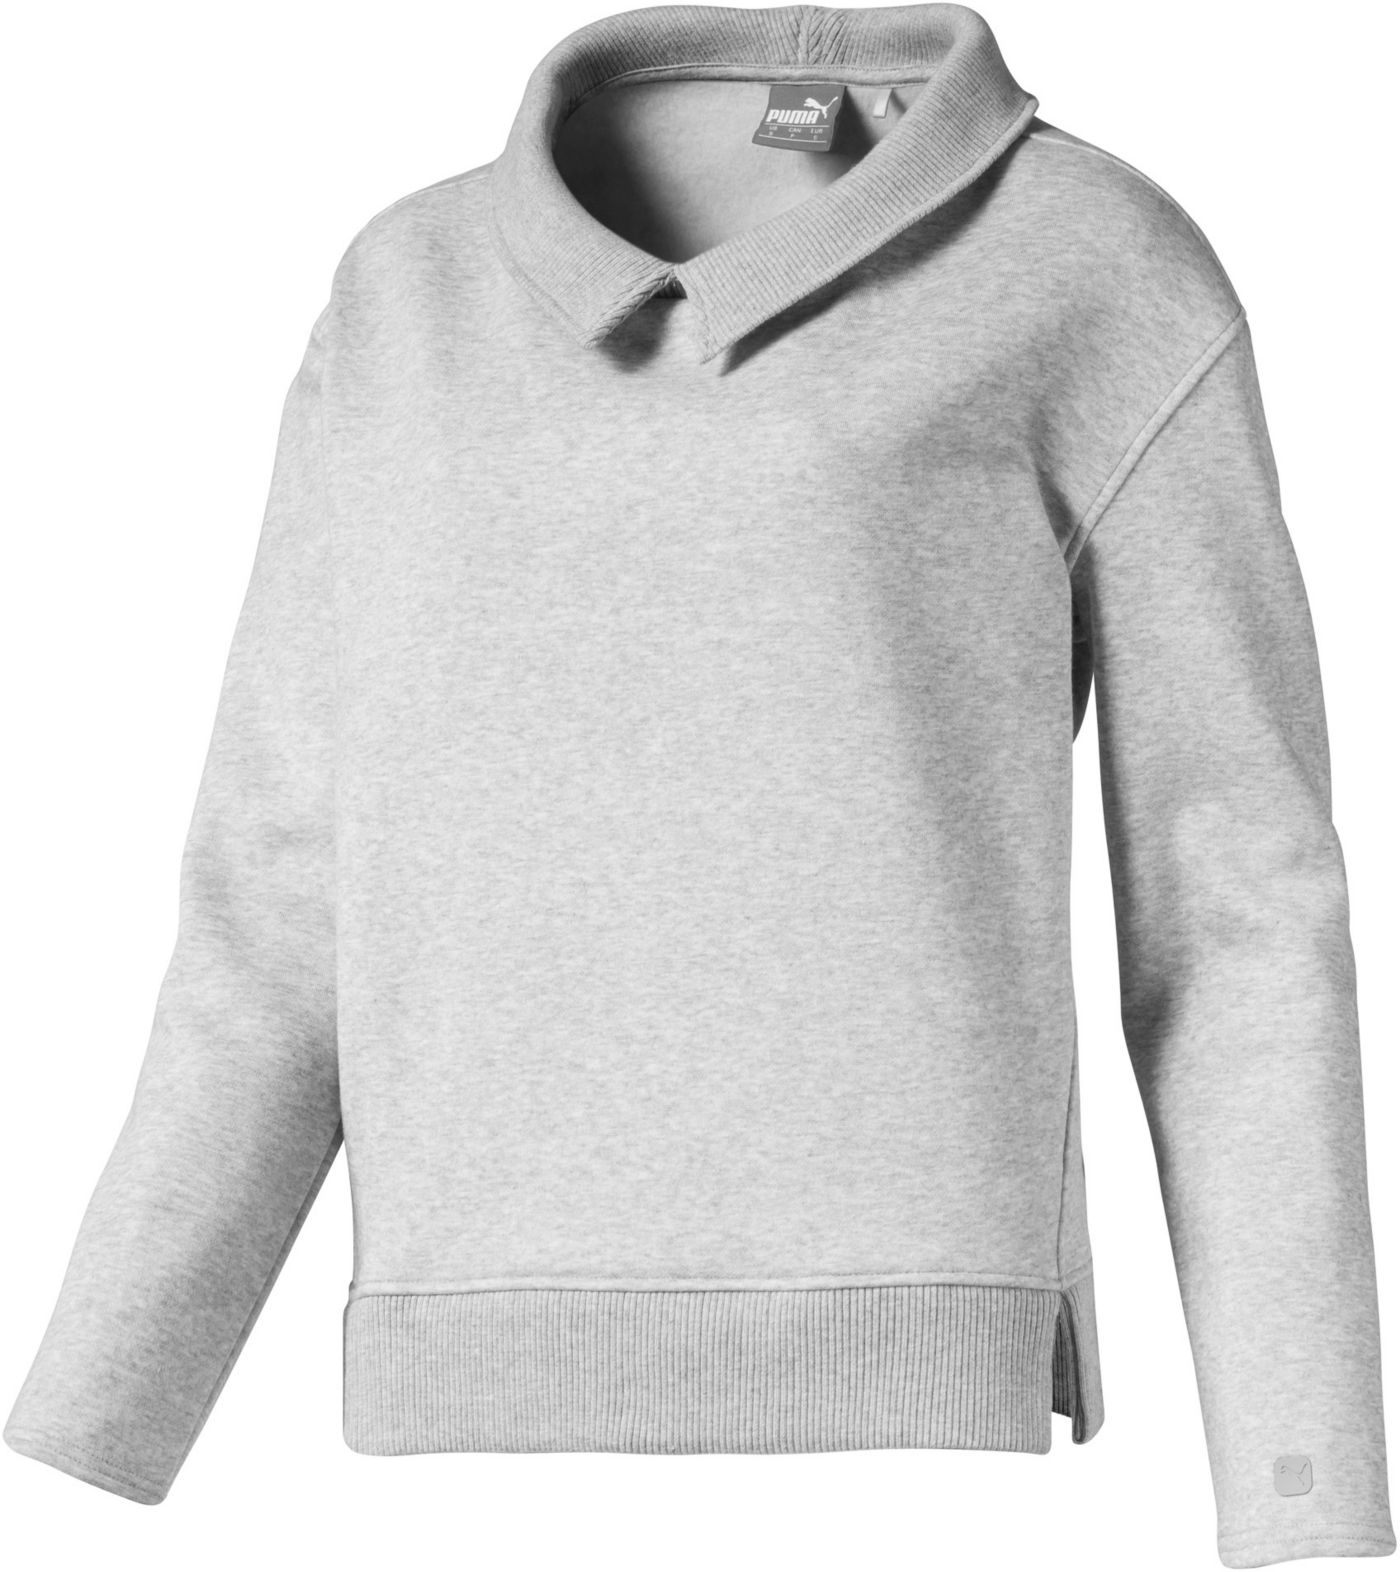 PUMA Women's Cozy Fleece Golf Pullover